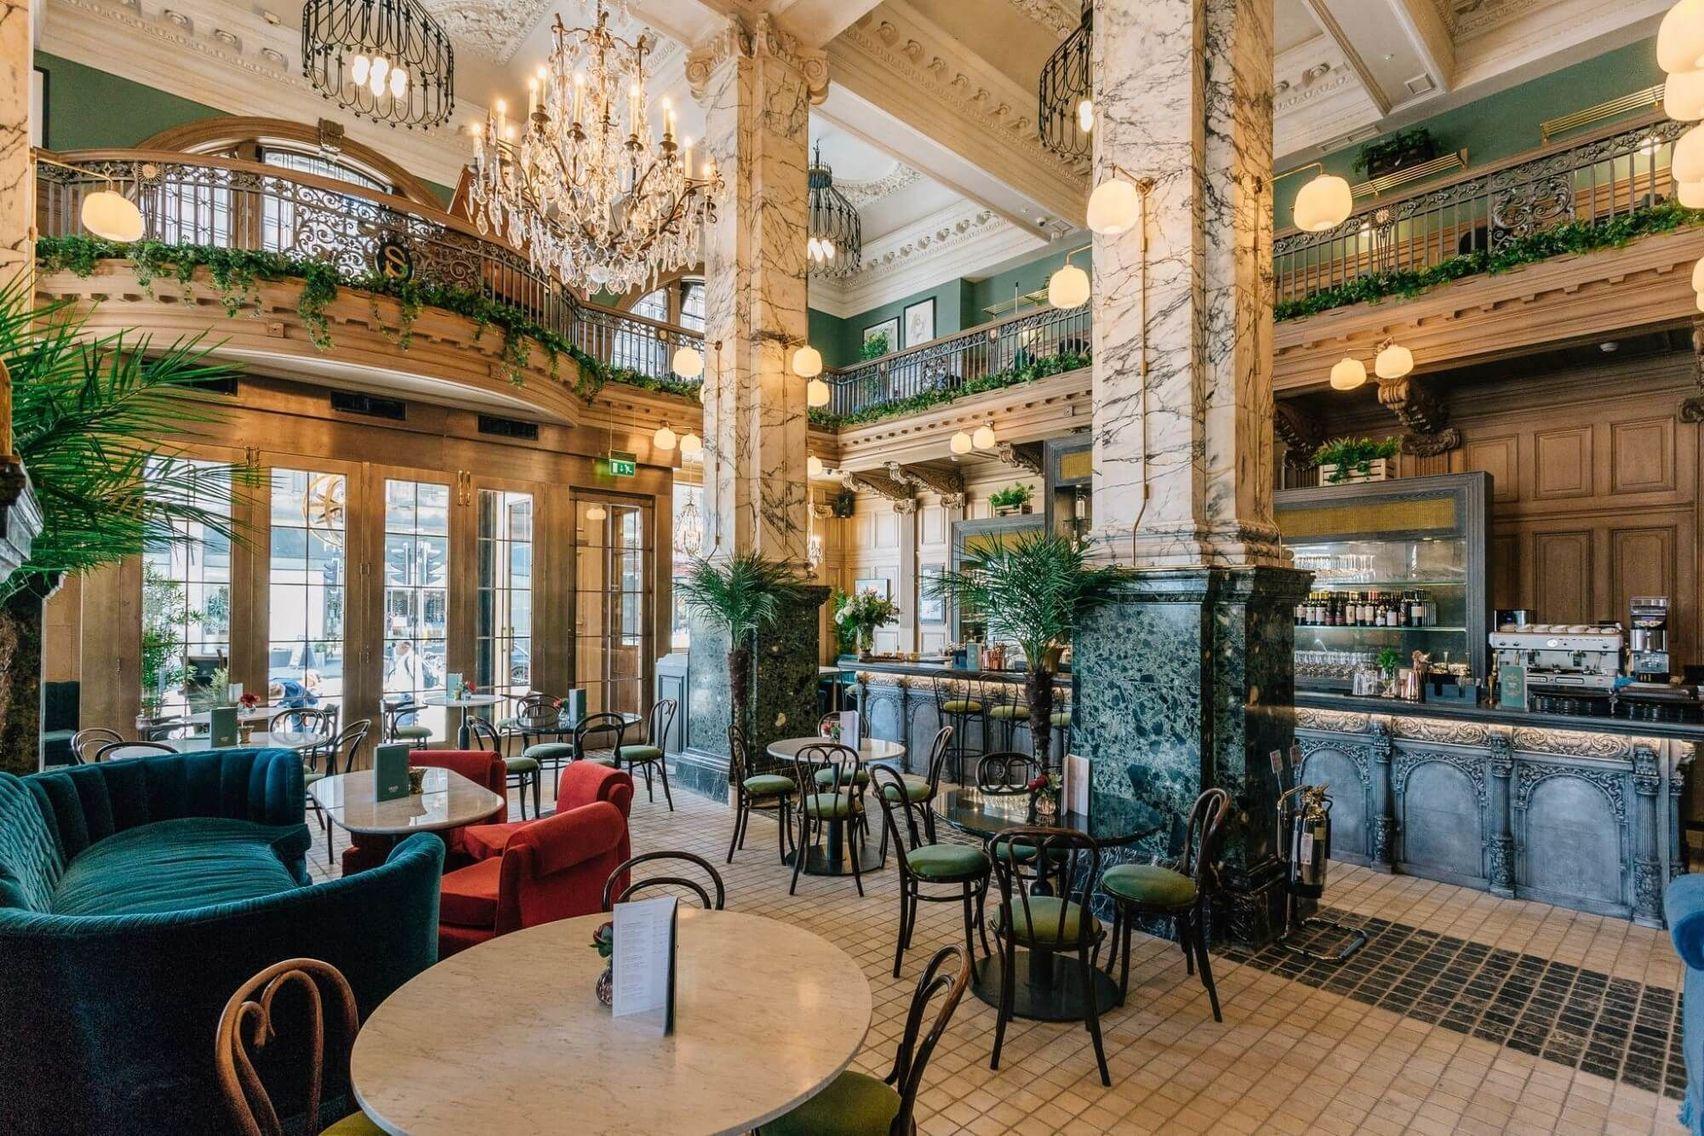 Restaurant Space, Grand Cafe